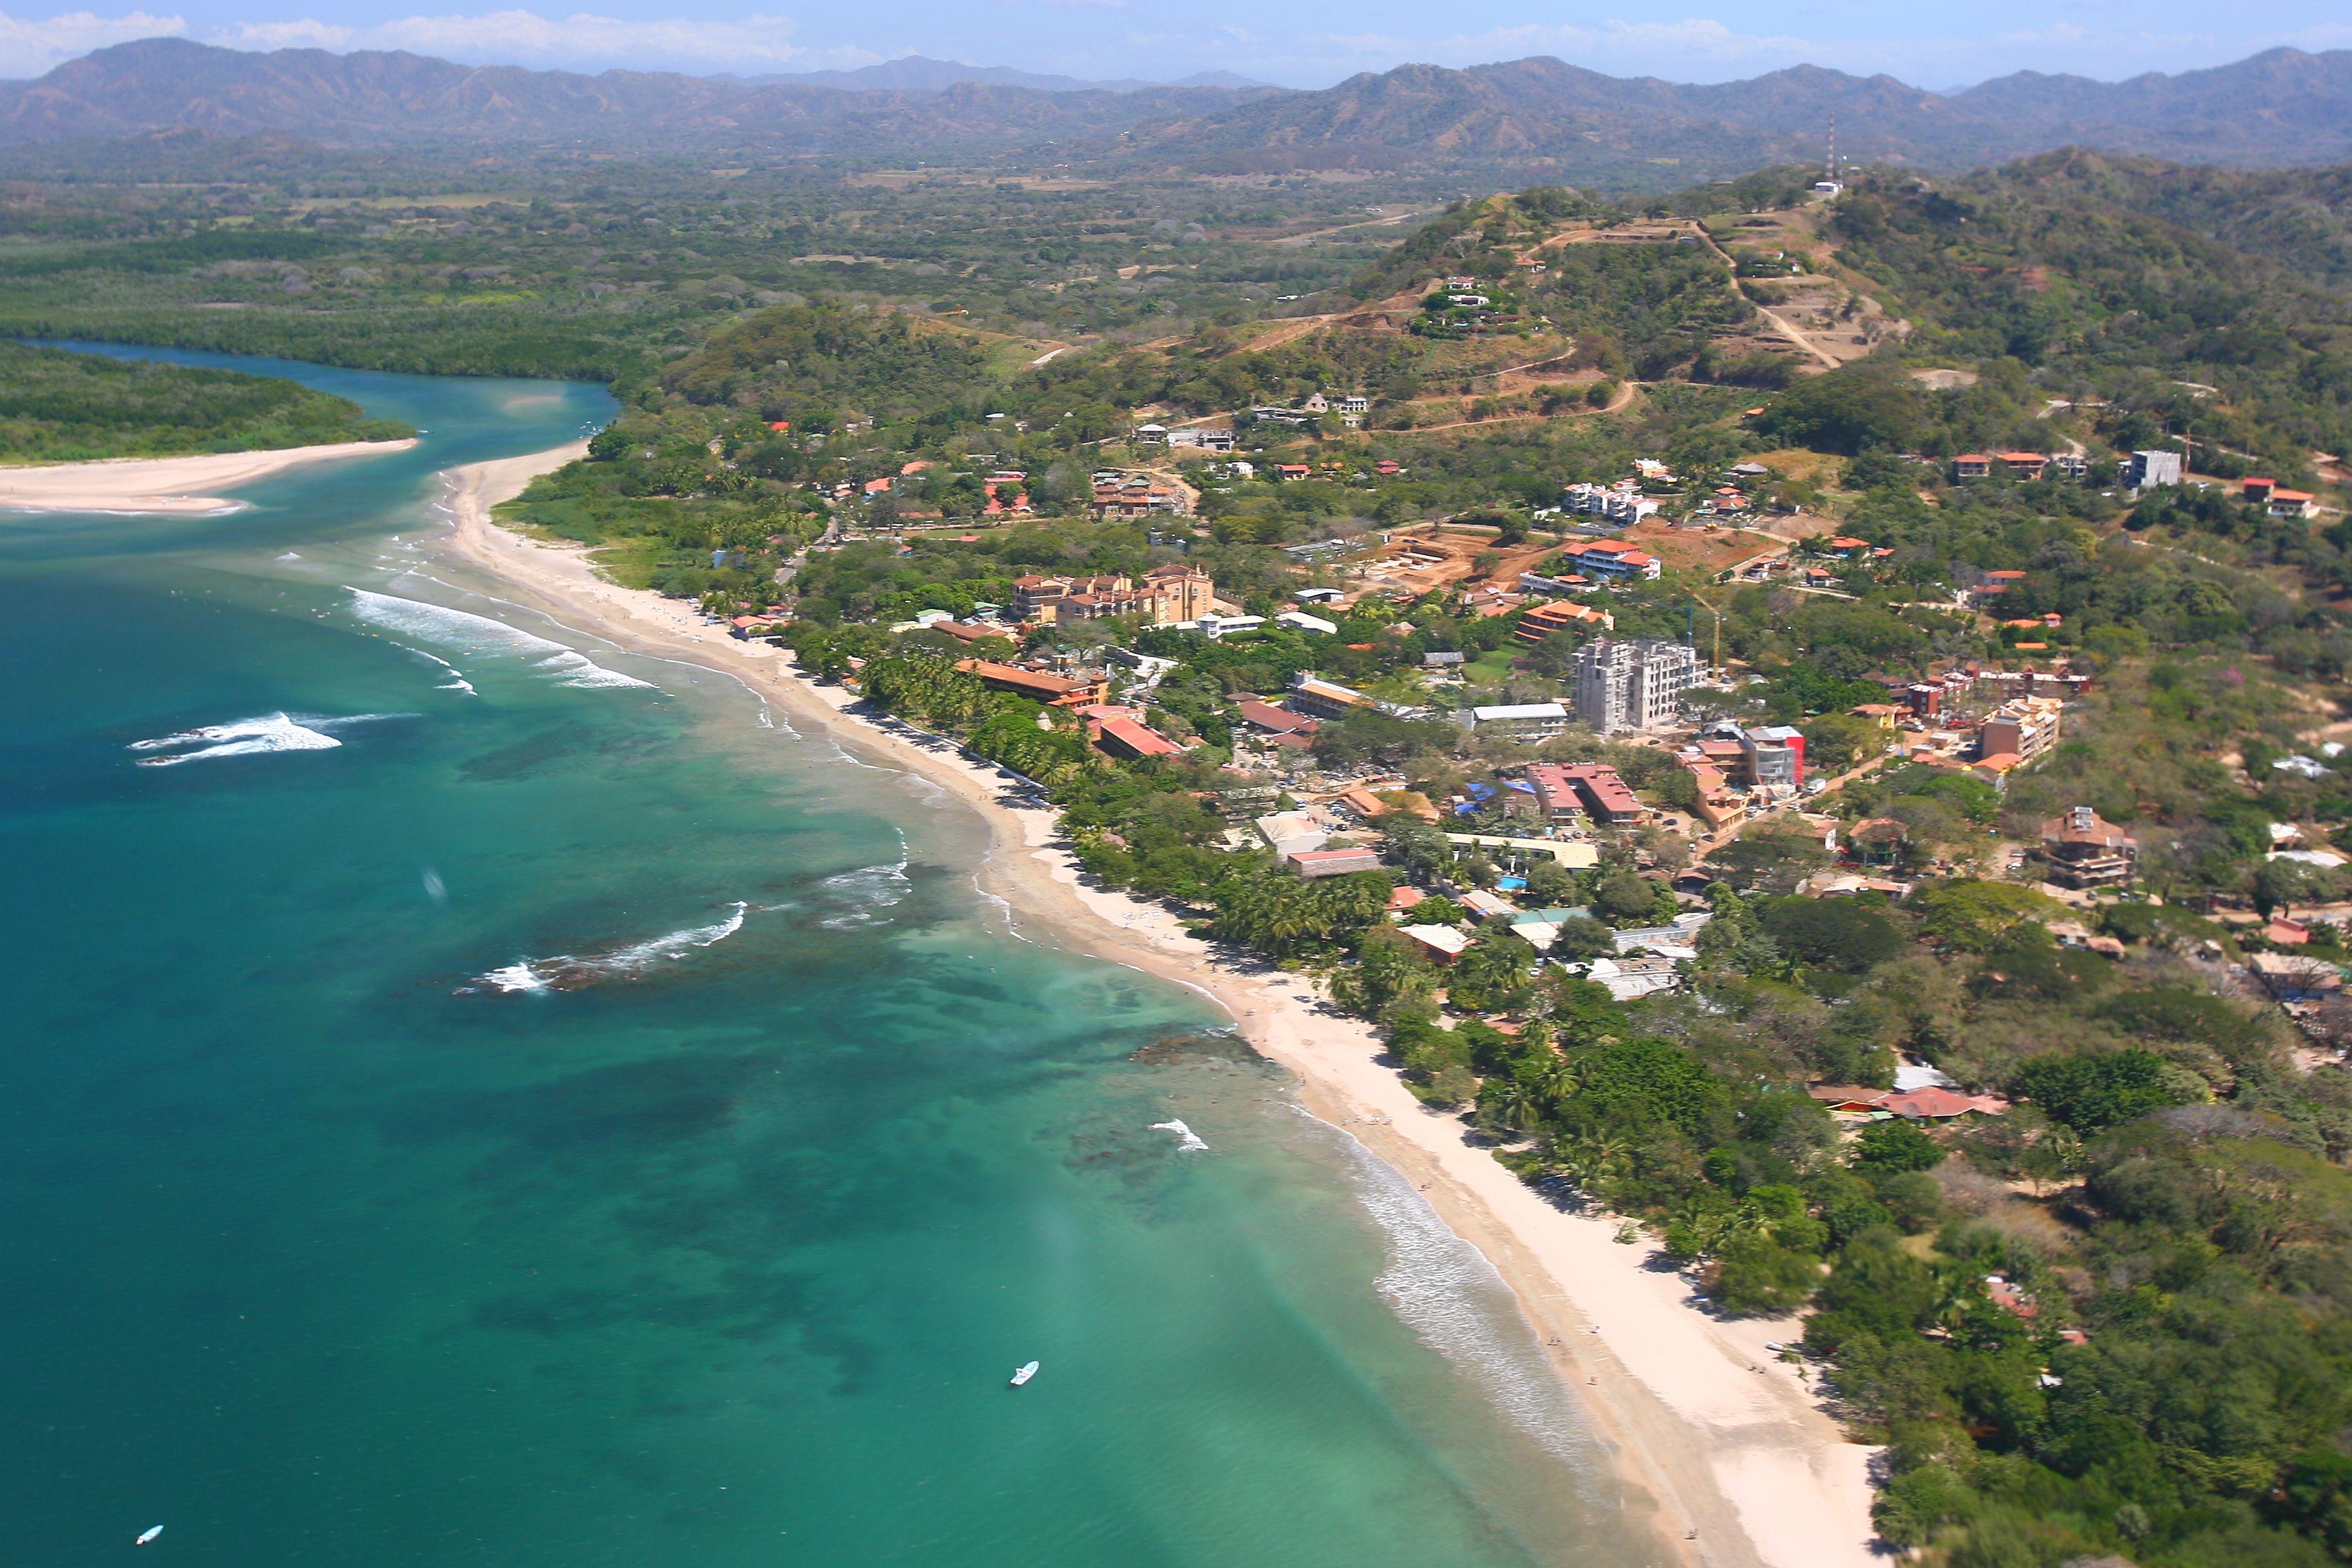 Costa Rica Playa Tamarindo and Rivermouth 2007 Aerial Photograph Tamarindowiki 01